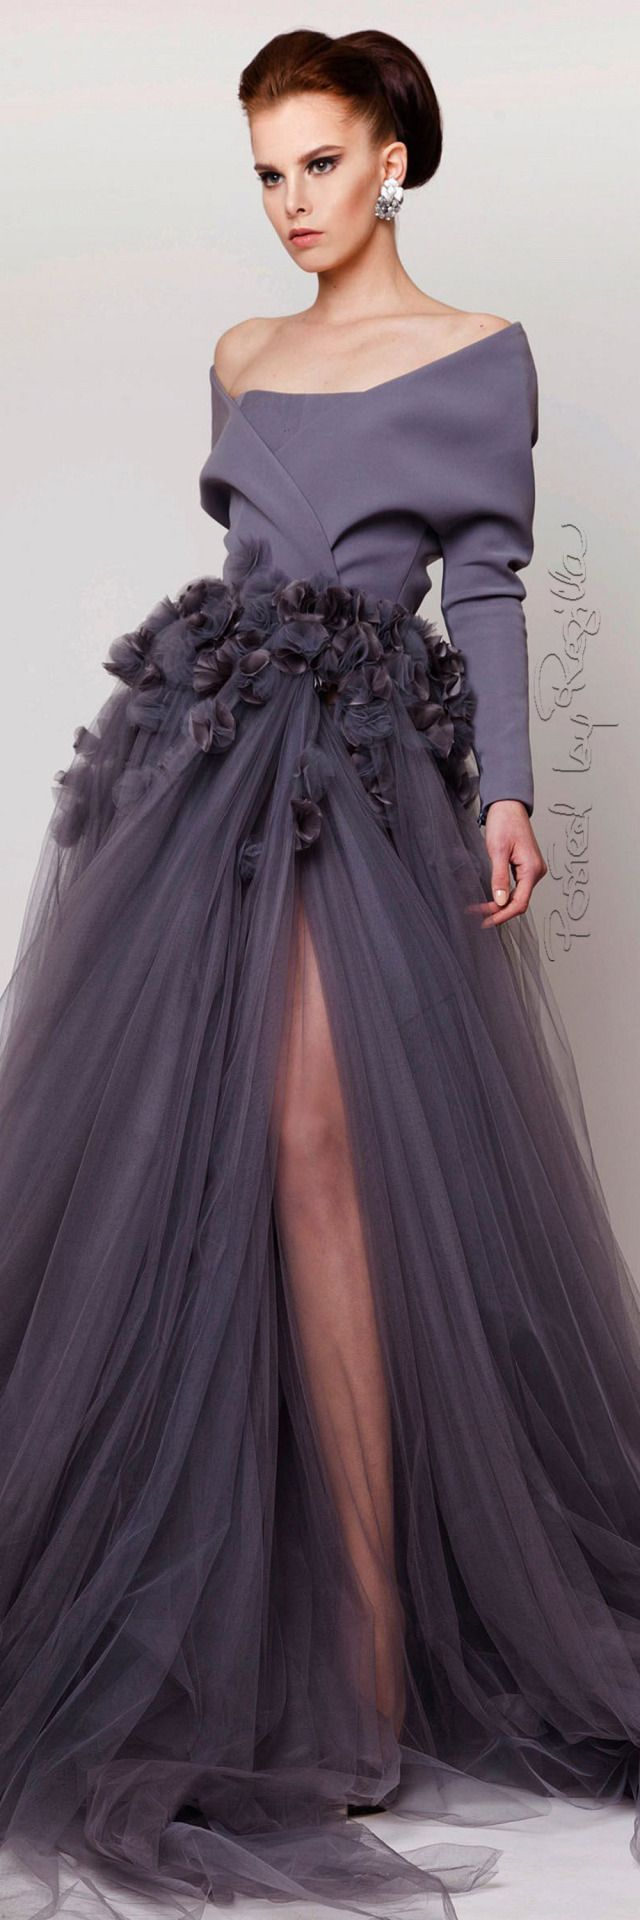 Azzi + Osta ~ Off the Shoulder Gown w Full Chiffon Skirt, 2015 jαɢlαdy